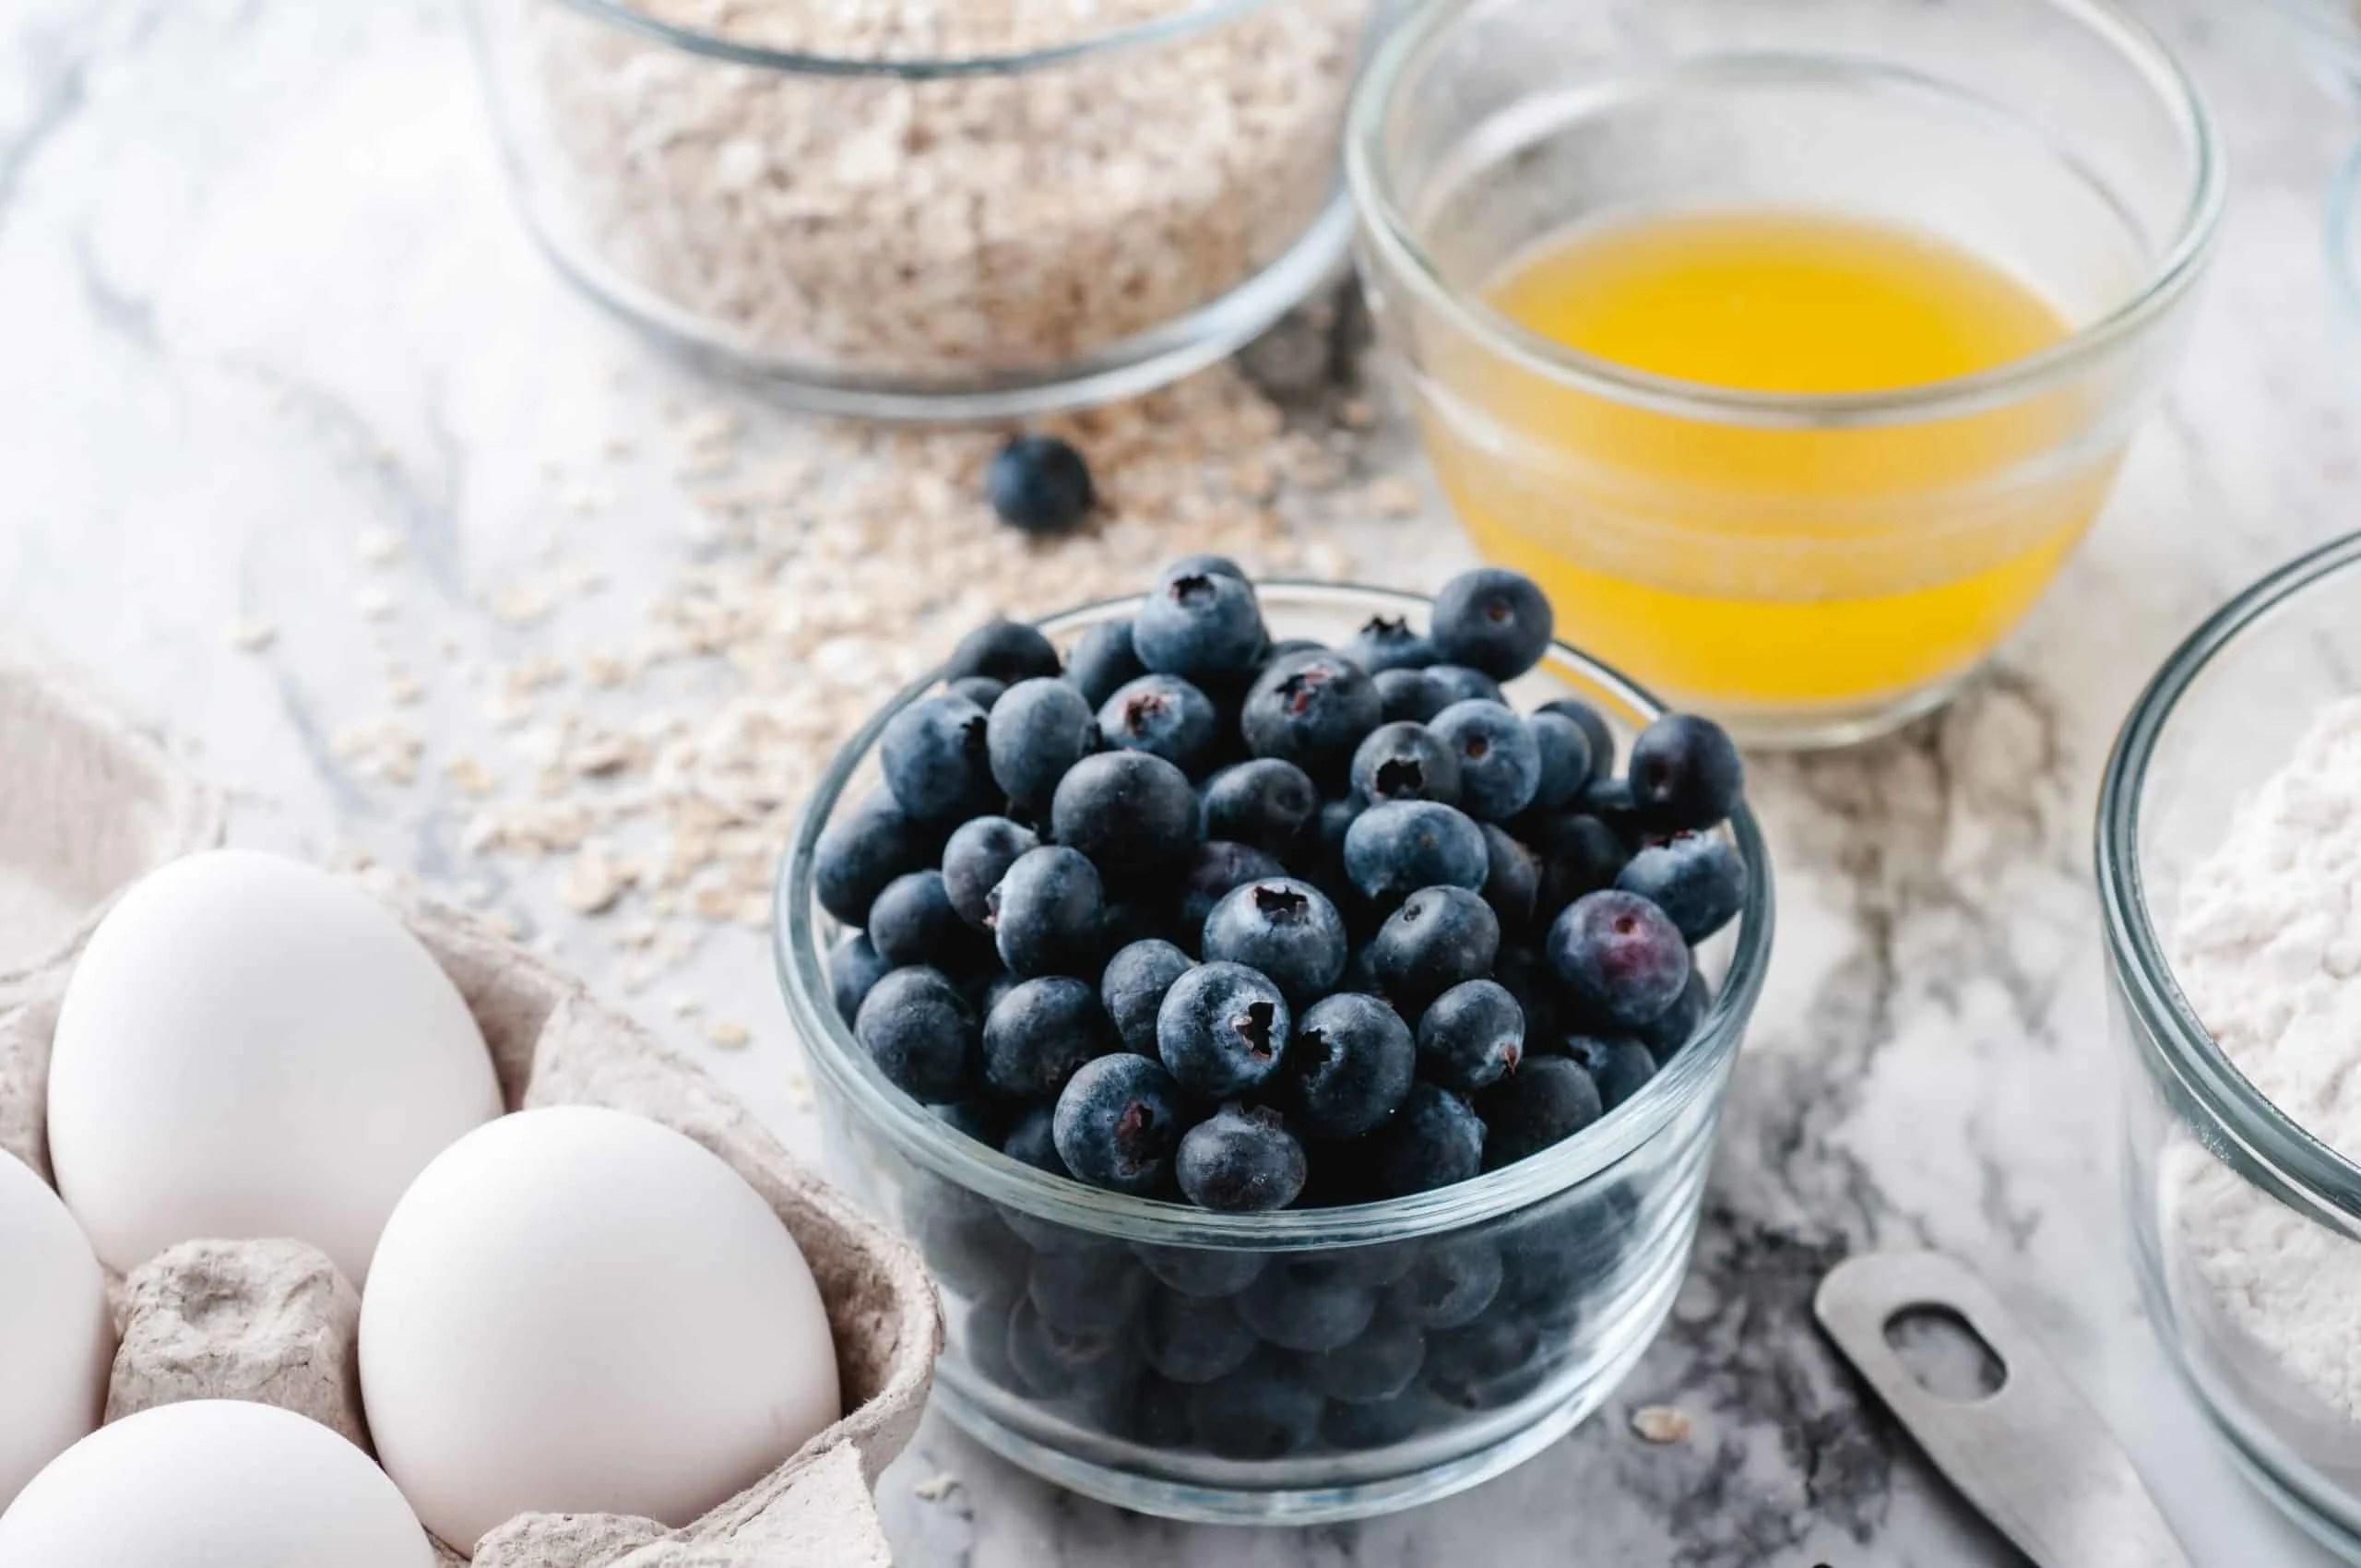 Ingredients for blueberry buttermilk muffins.